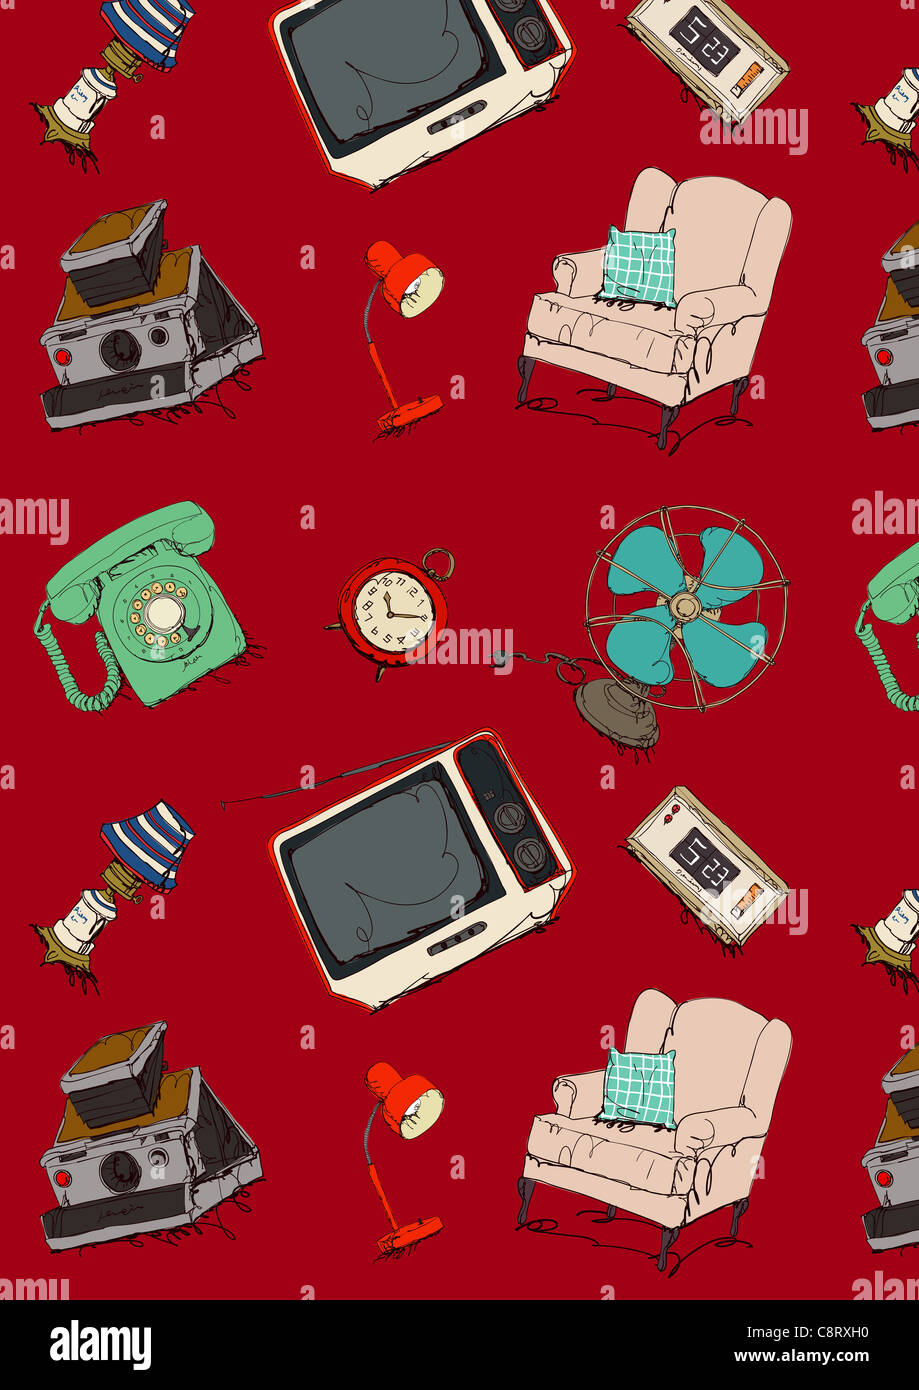 Consumer Product Icon Set - Stock Image